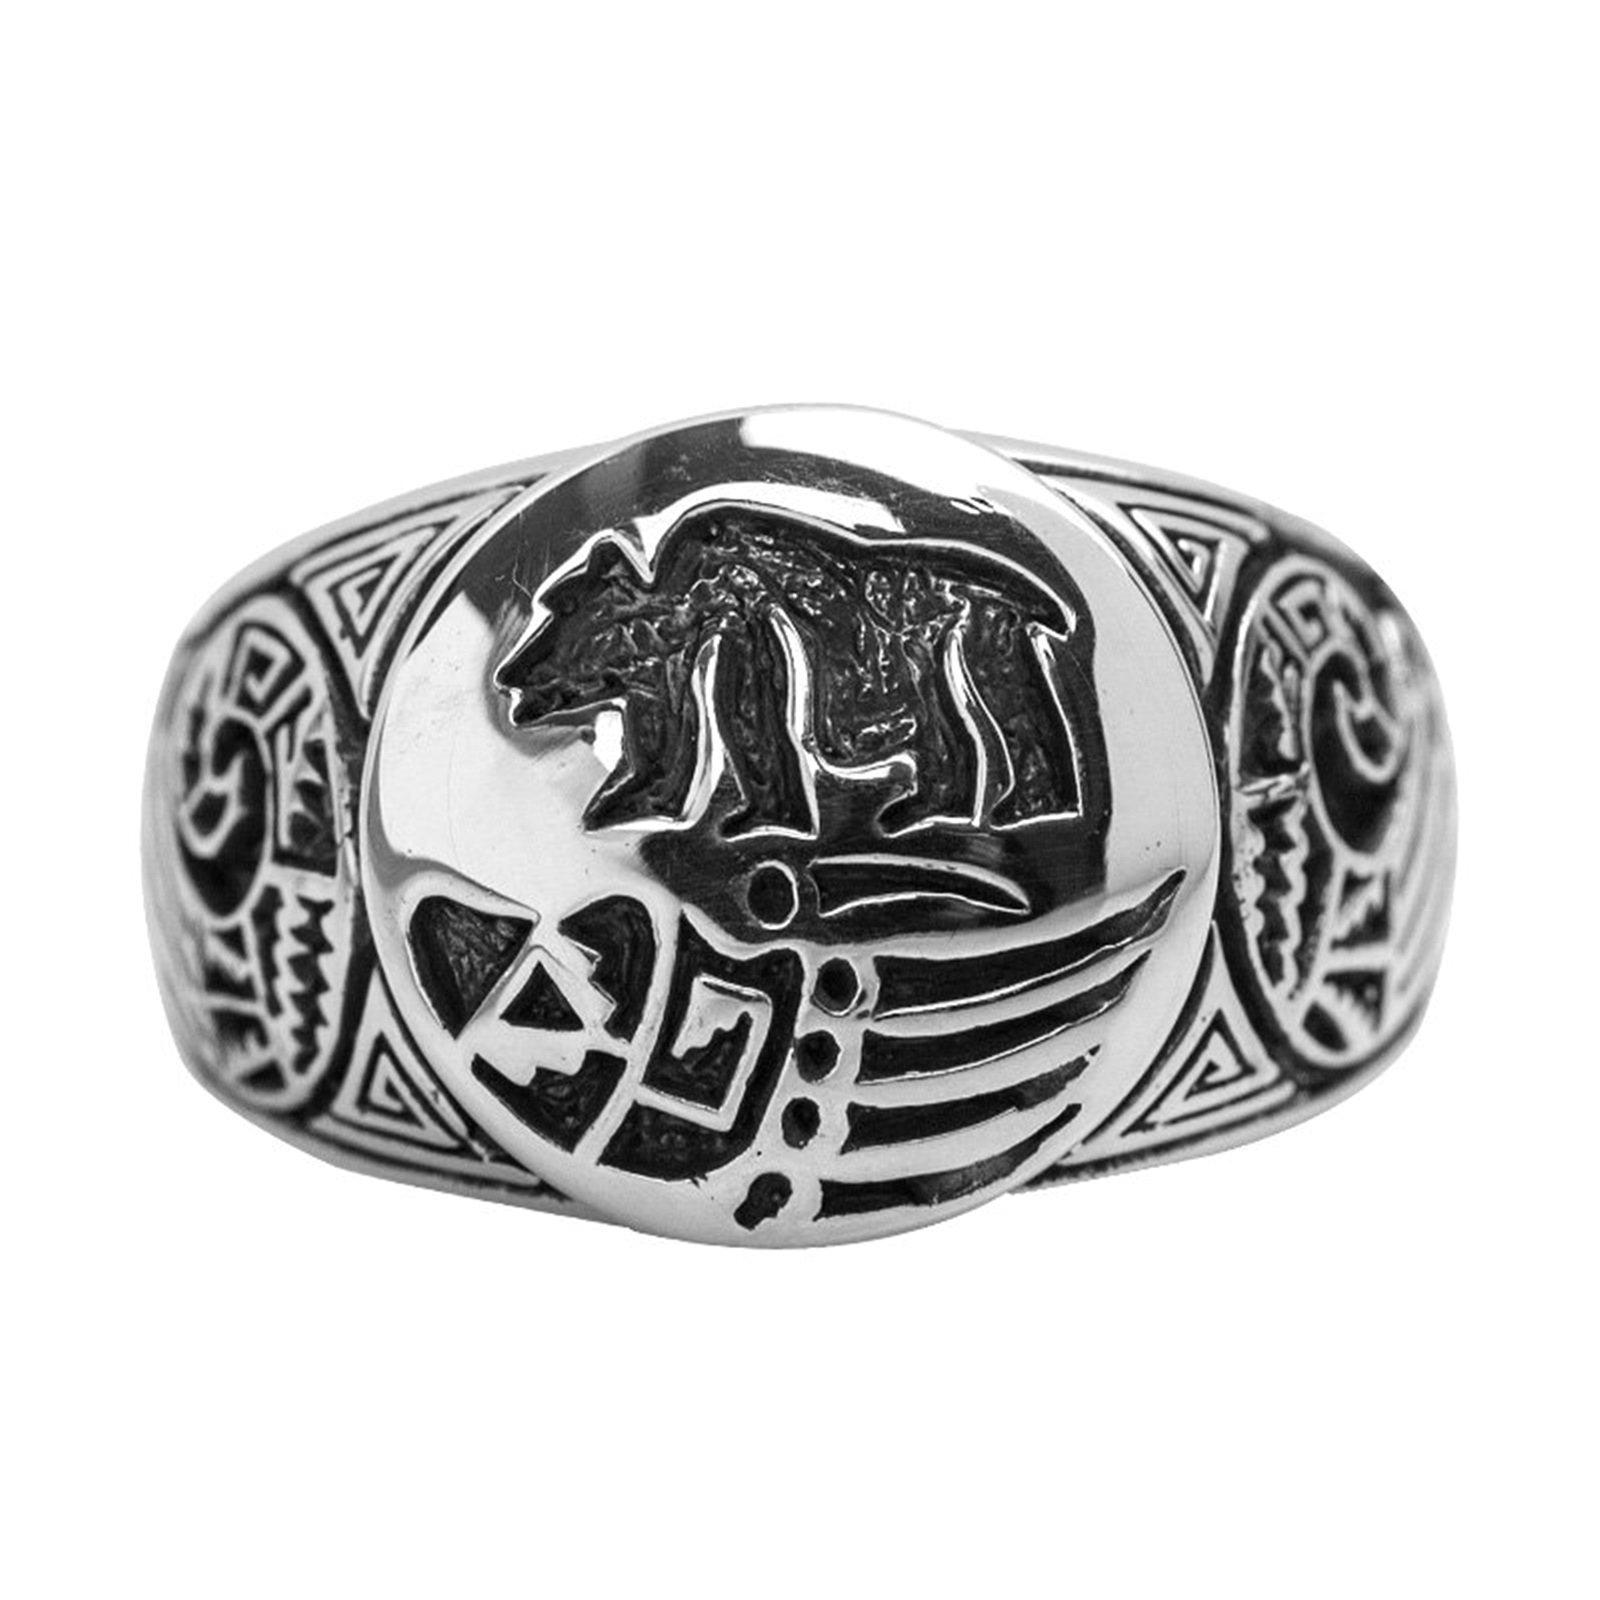 Epinki 925 Sterling Silver Punk Rock Vintage Gothic Carved Bear Ring for Men Size 9 by Epinki